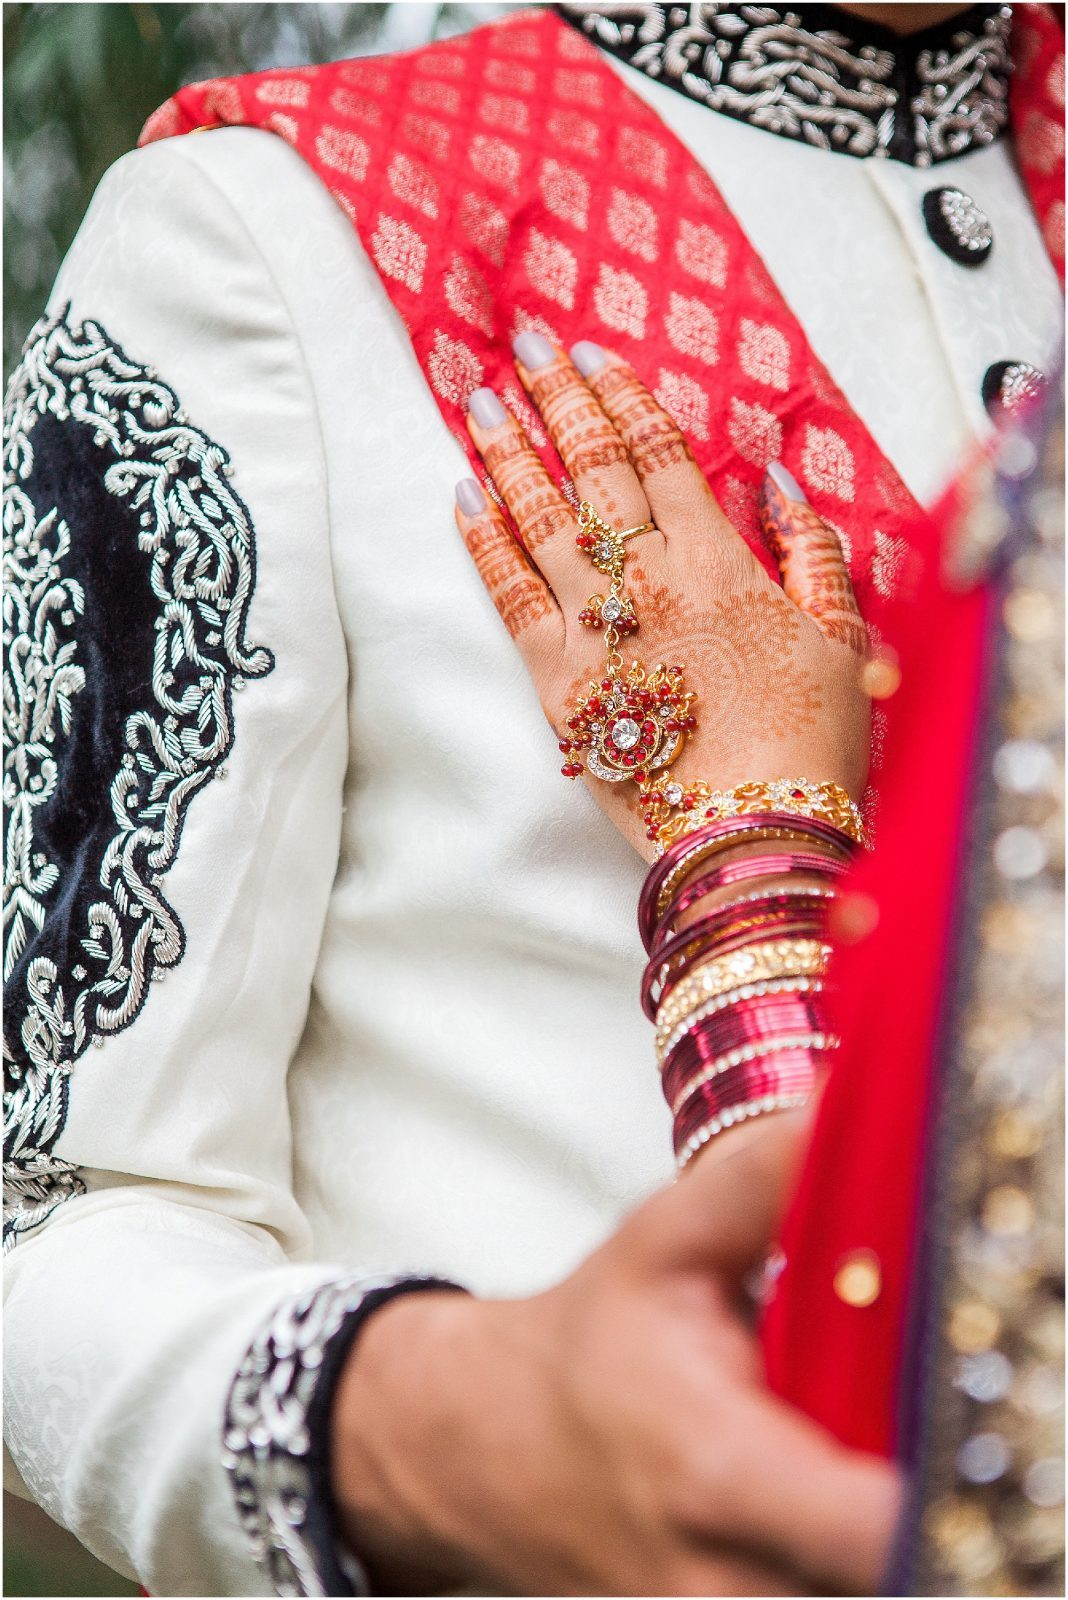 South Asian Wedding Toronto - Mehndi - Nikah, walima, indian wedding, pakistani wedding. Sarah & Sajid - first look - bridal mehndi